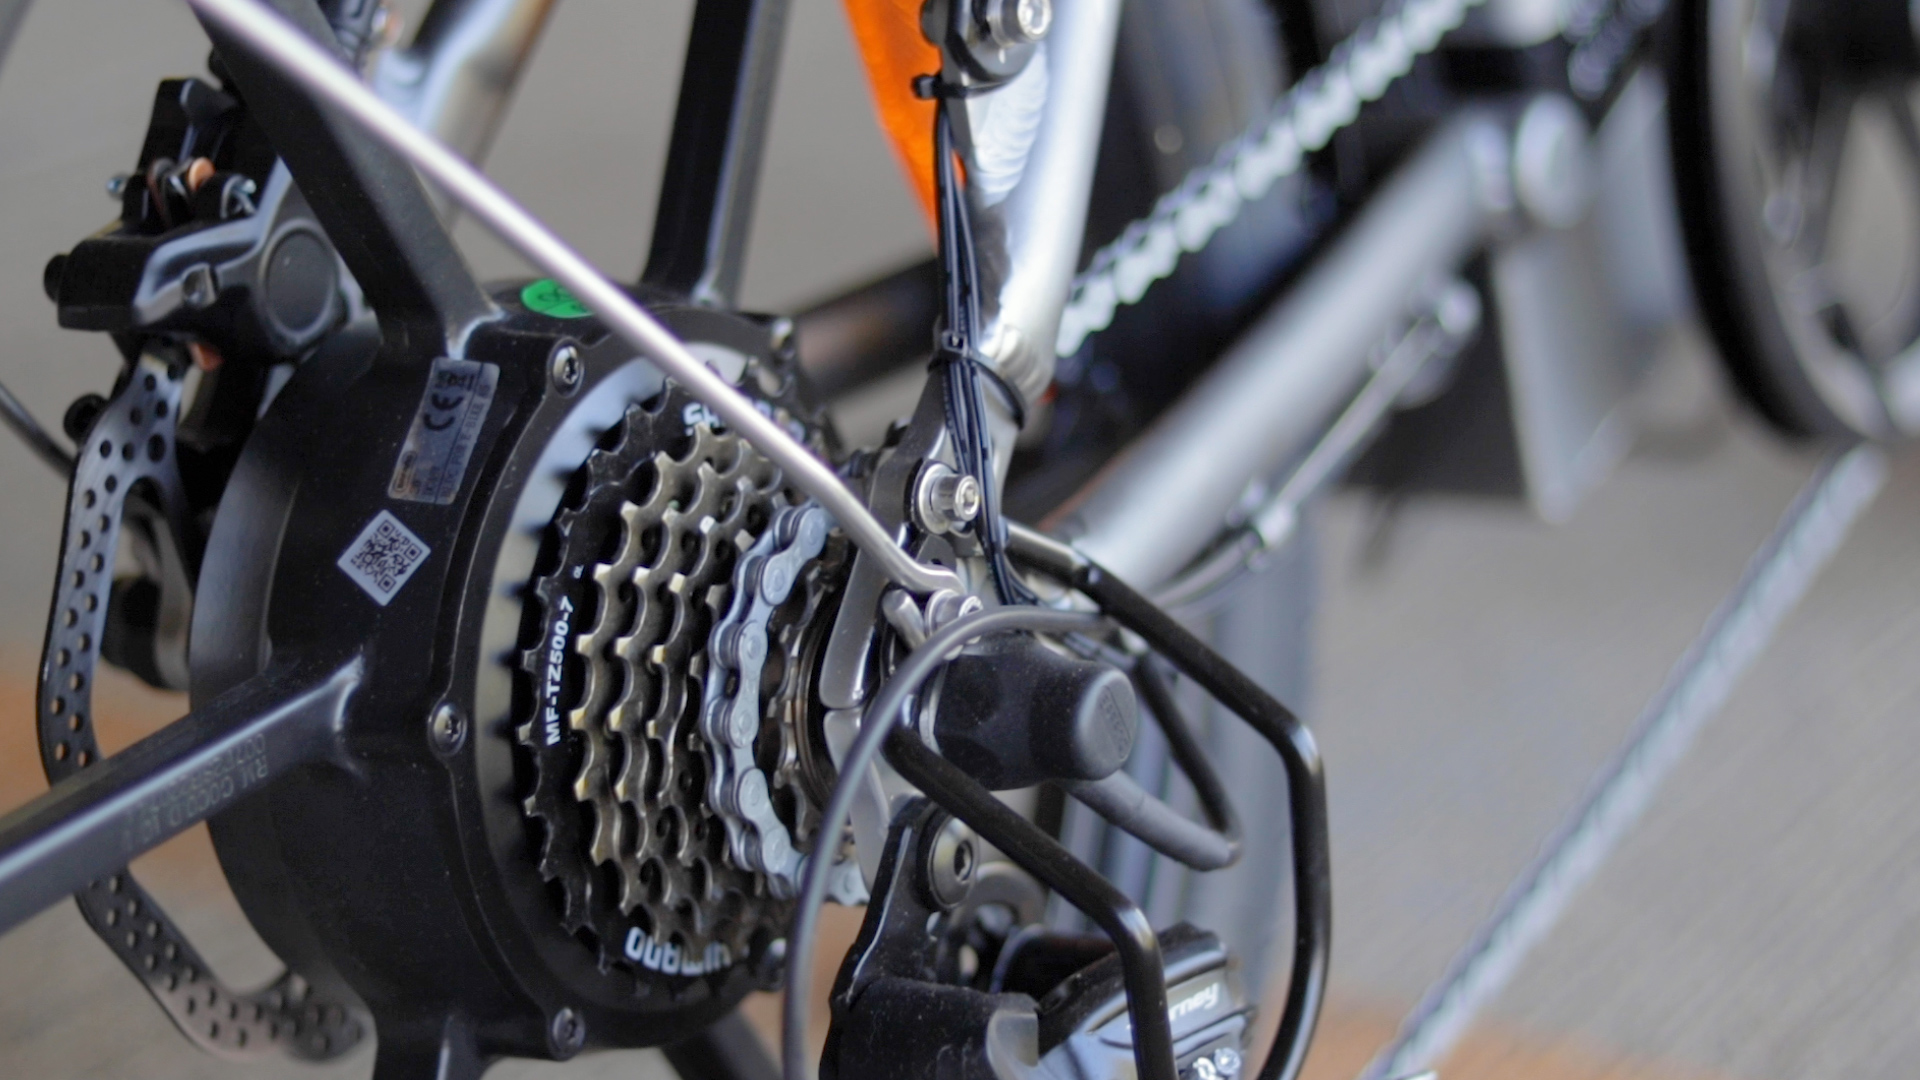 electrified-reviews-bagibike-b10-foldign-electric-bike-review-shimano-tourney-derailleur.jpg